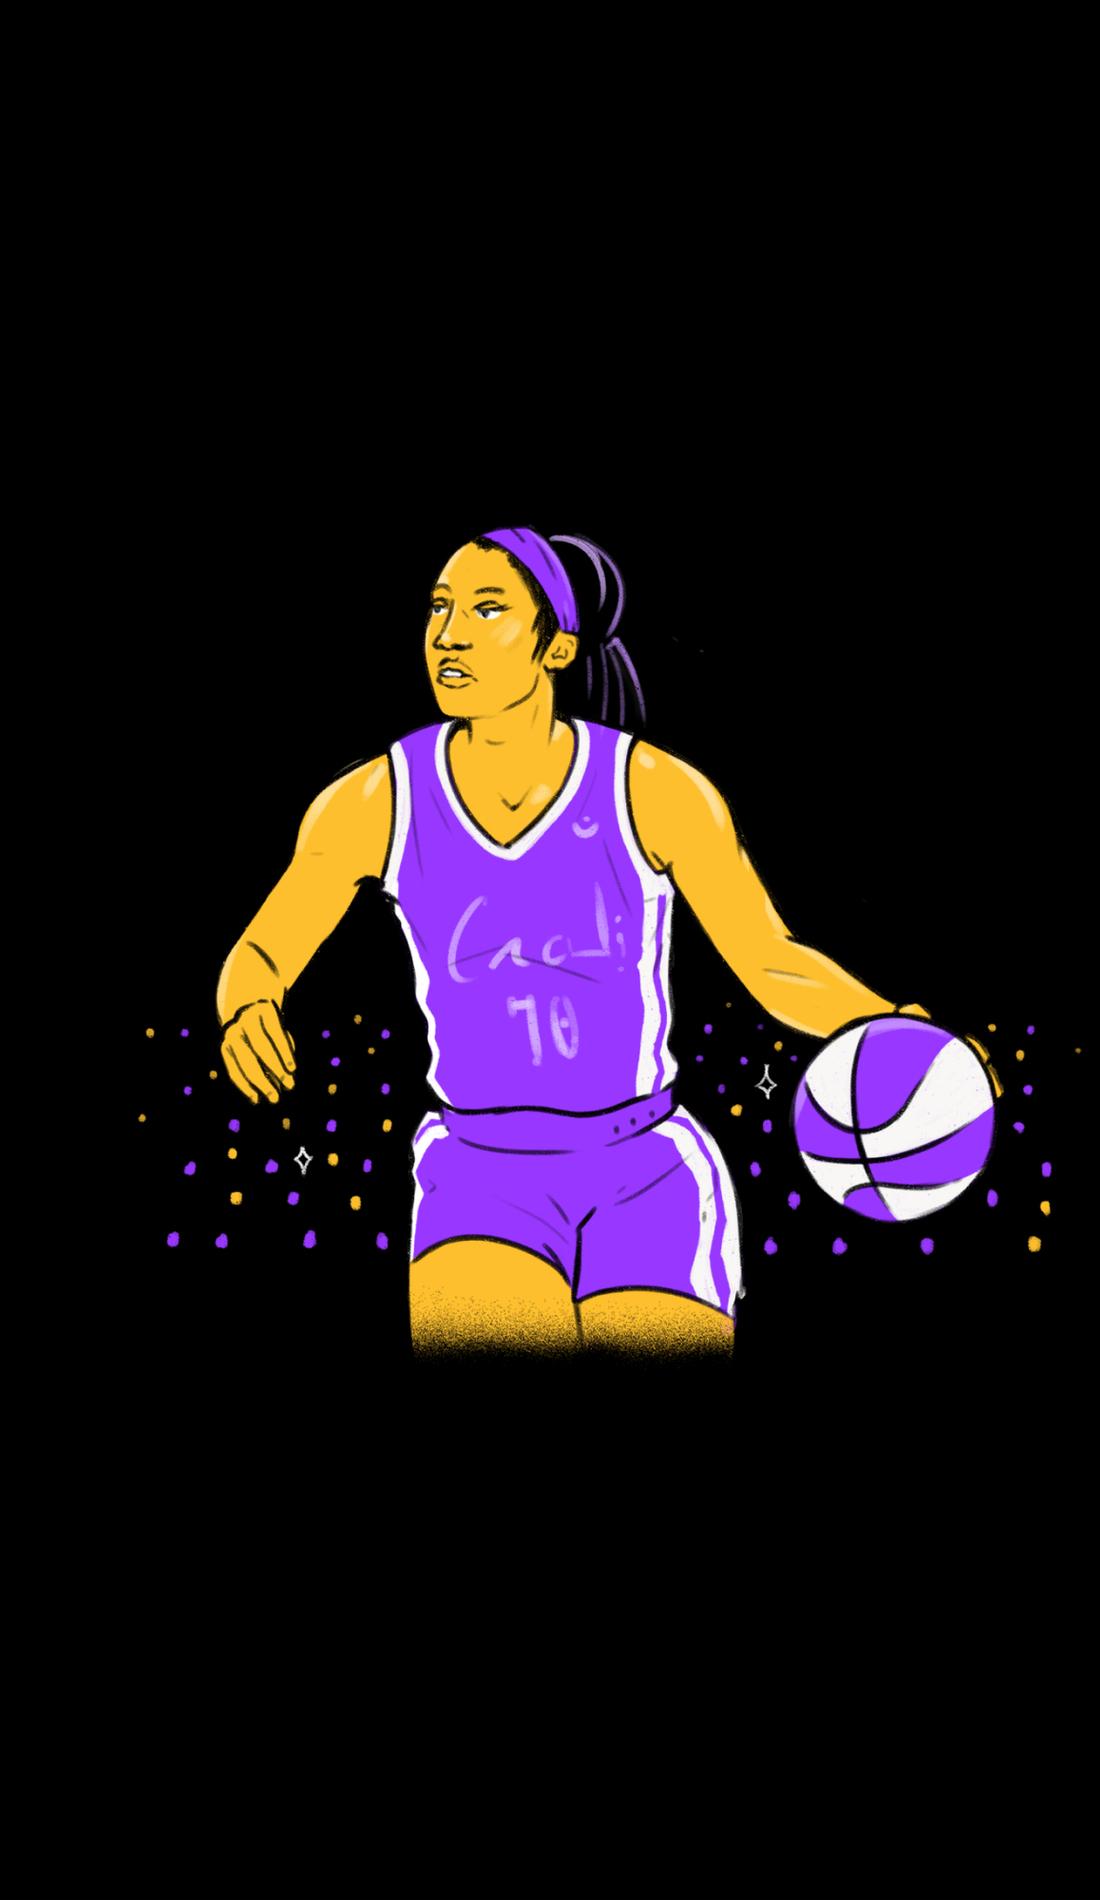 A Saint Mary's Gaels Womens Basketball live event